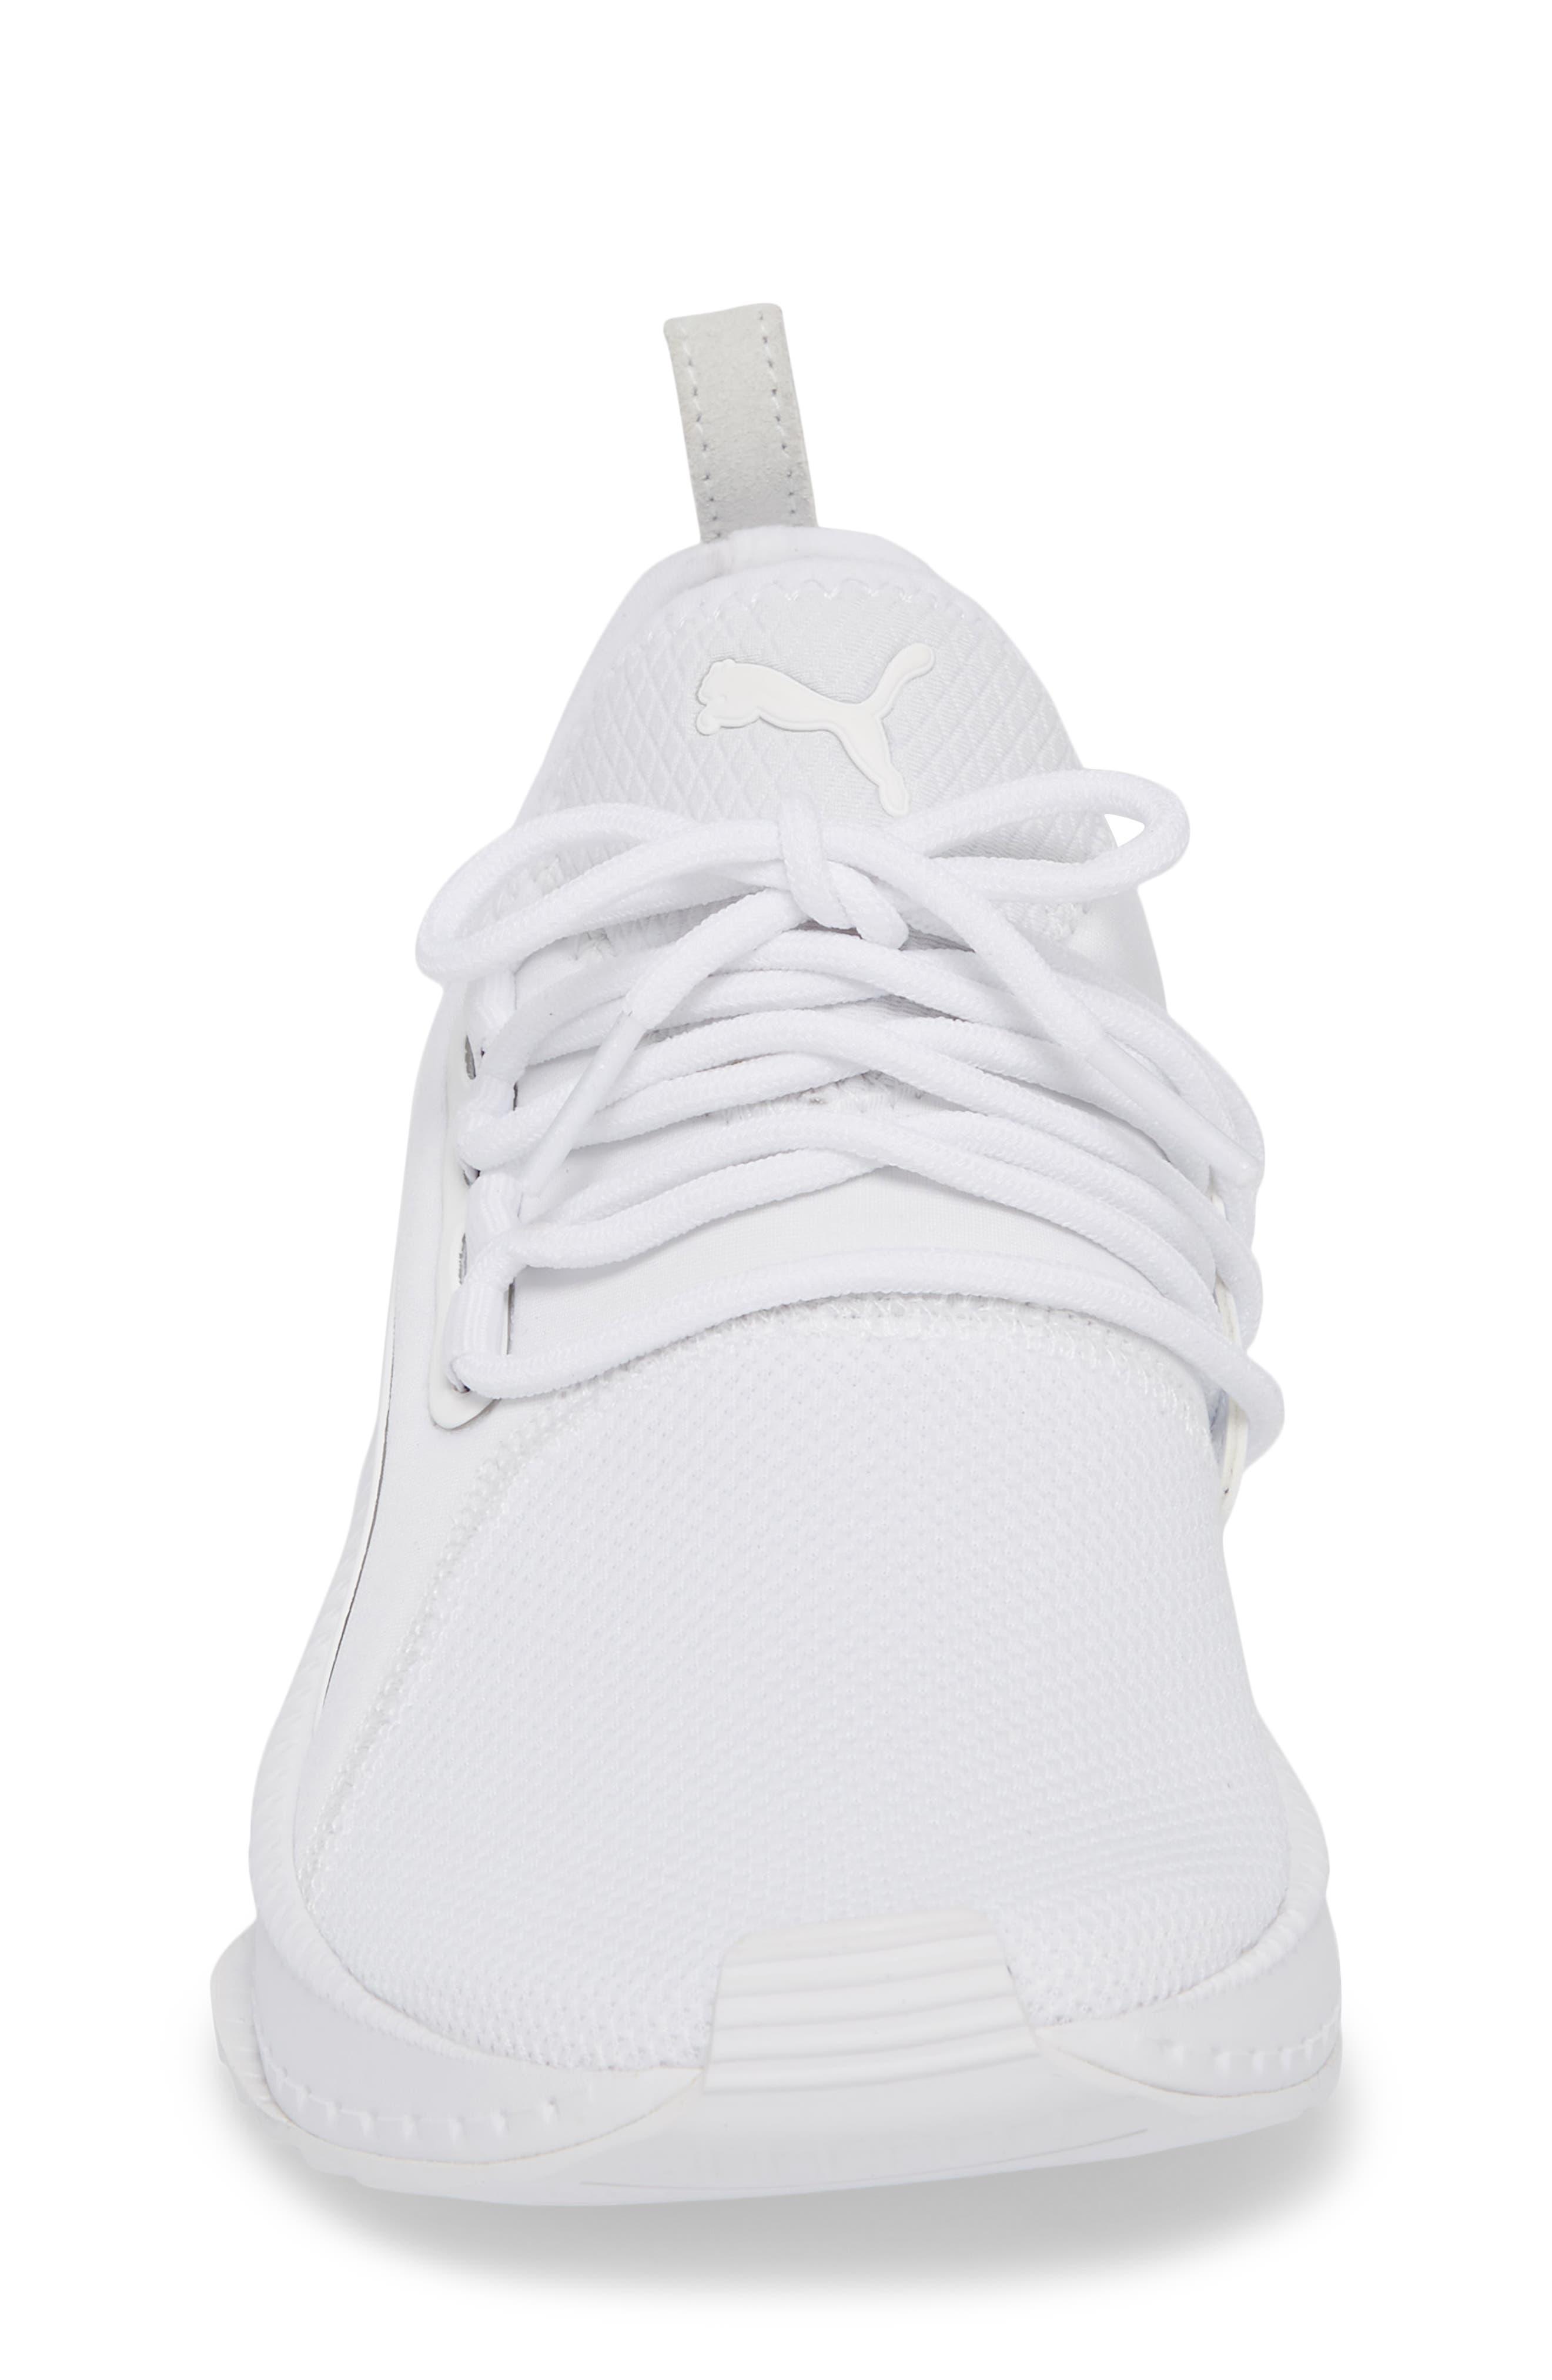 Tsugi Apex Sneaker,                             Alternate thumbnail 4, color,                             White/ White